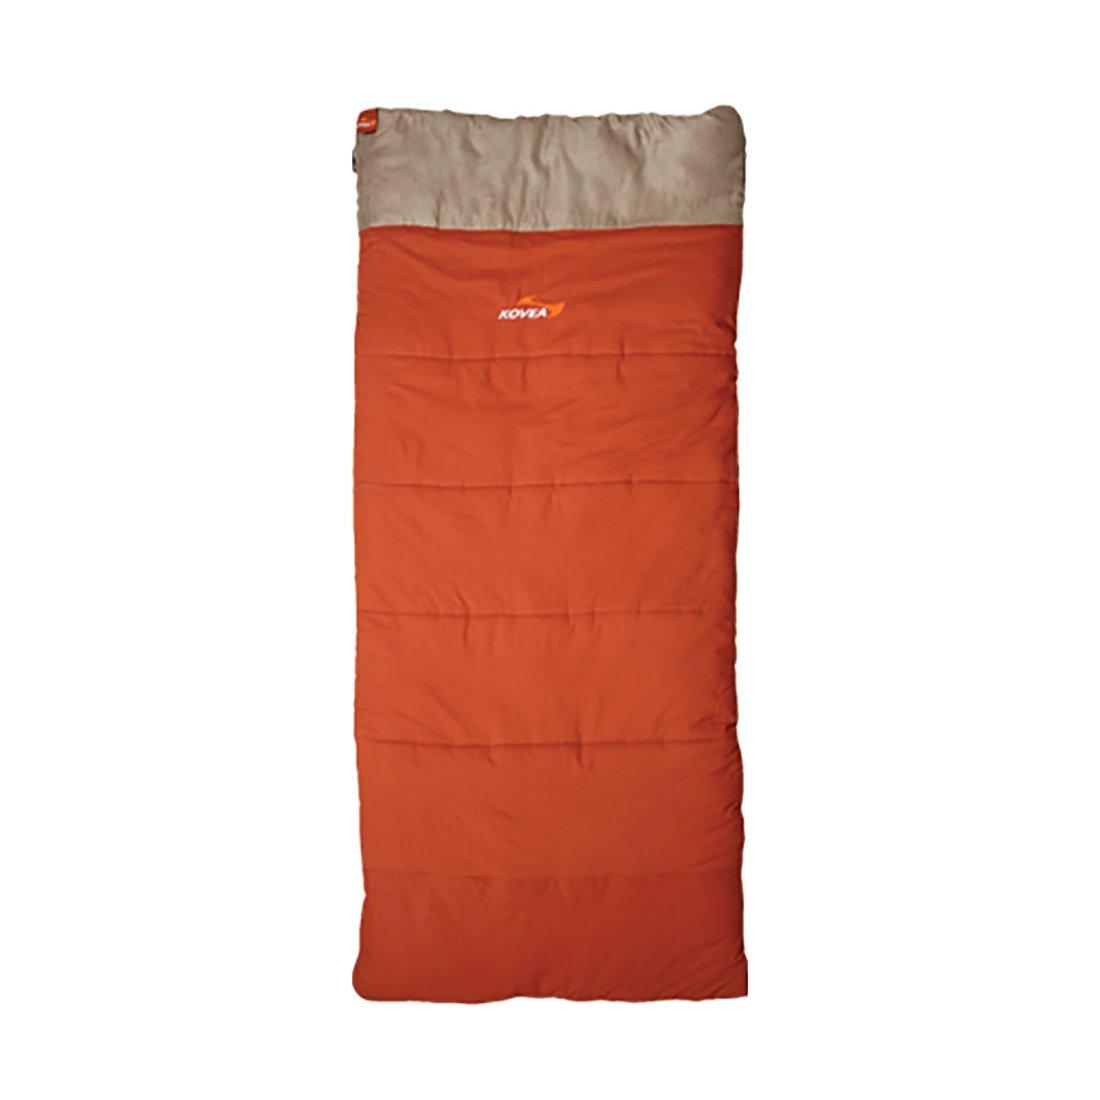 Kovea Alaska 1800 Sleeping Bag by Kovea